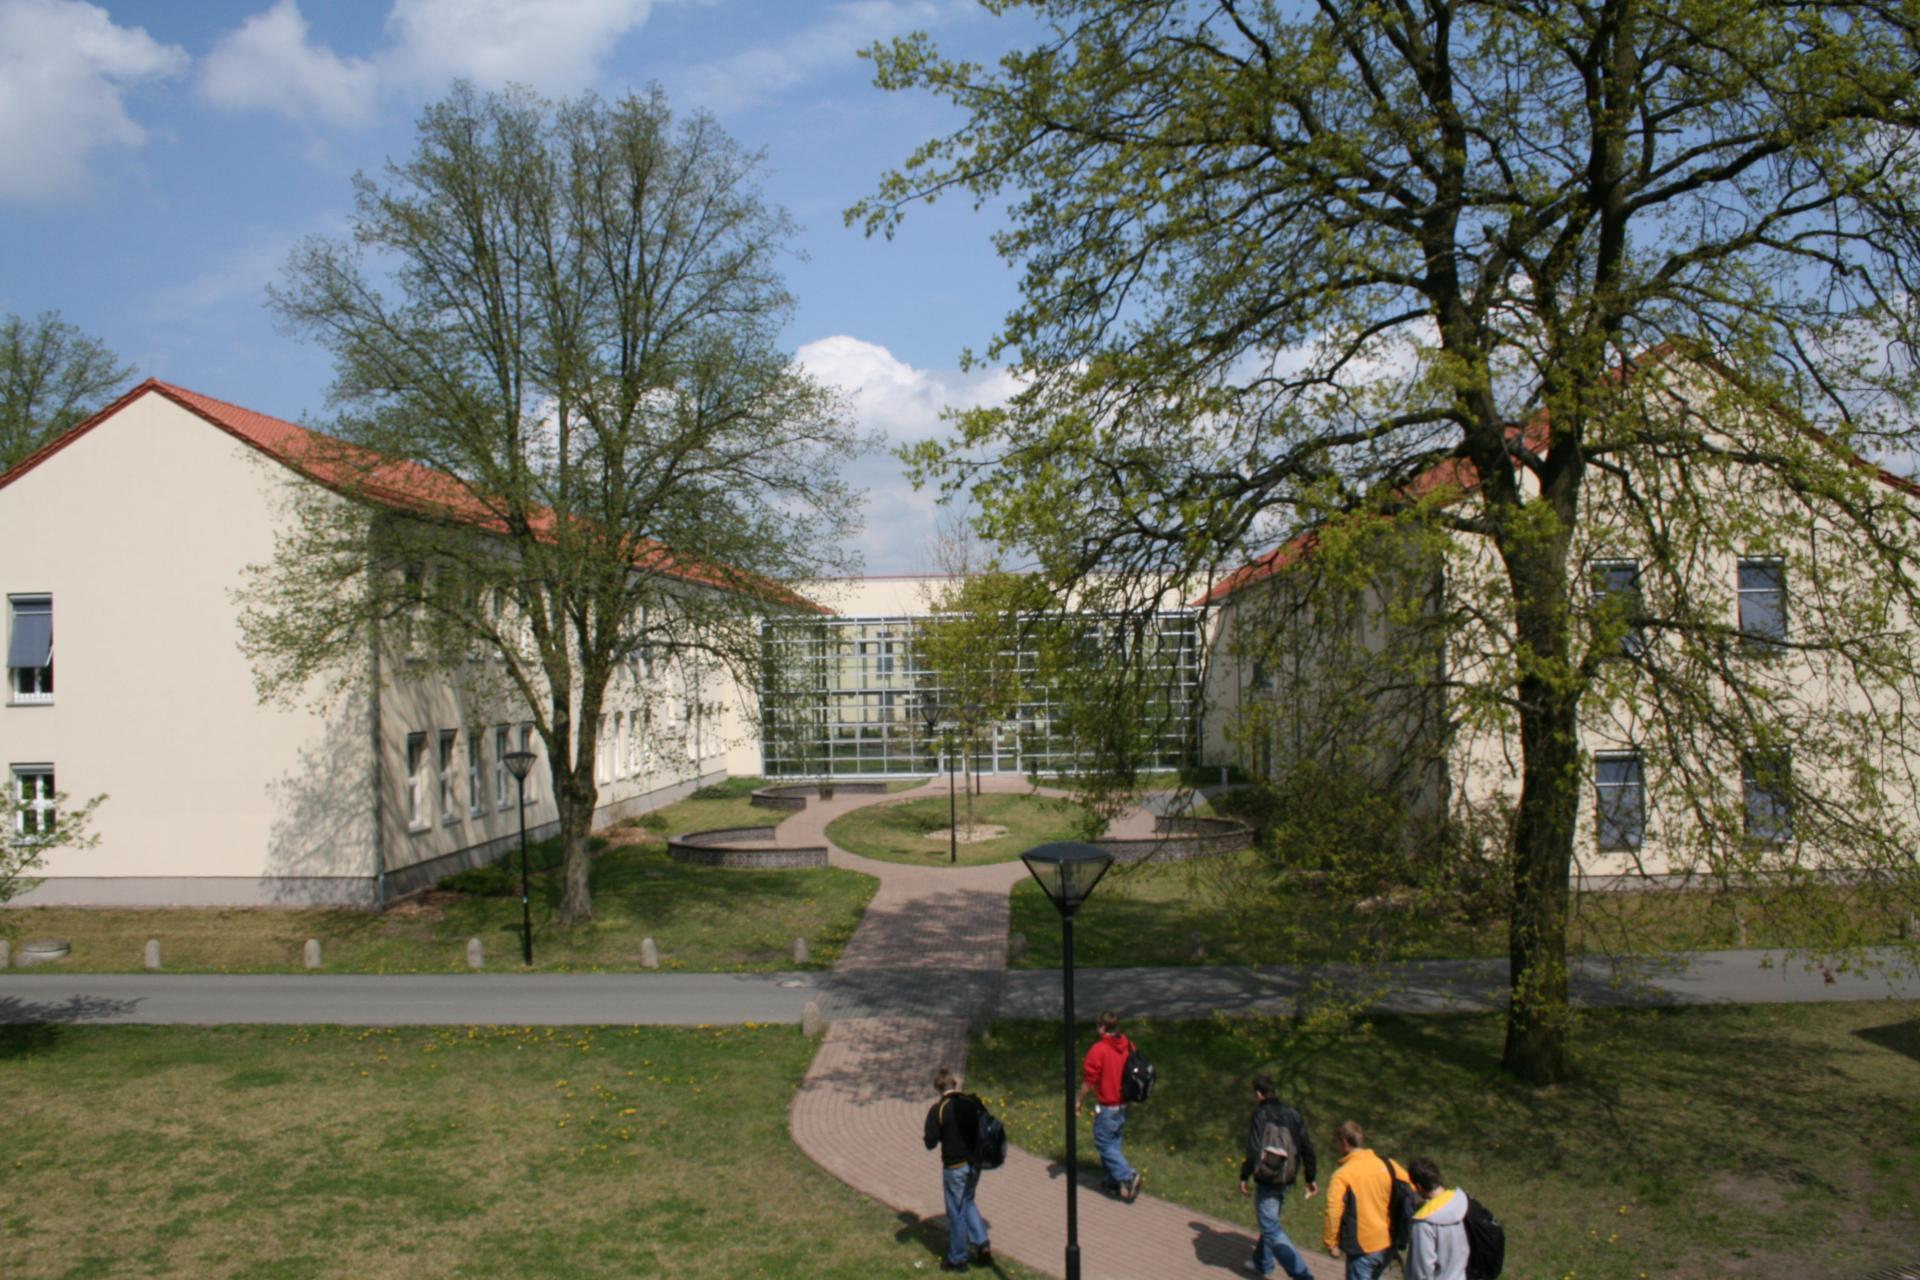 OSZ Havelland